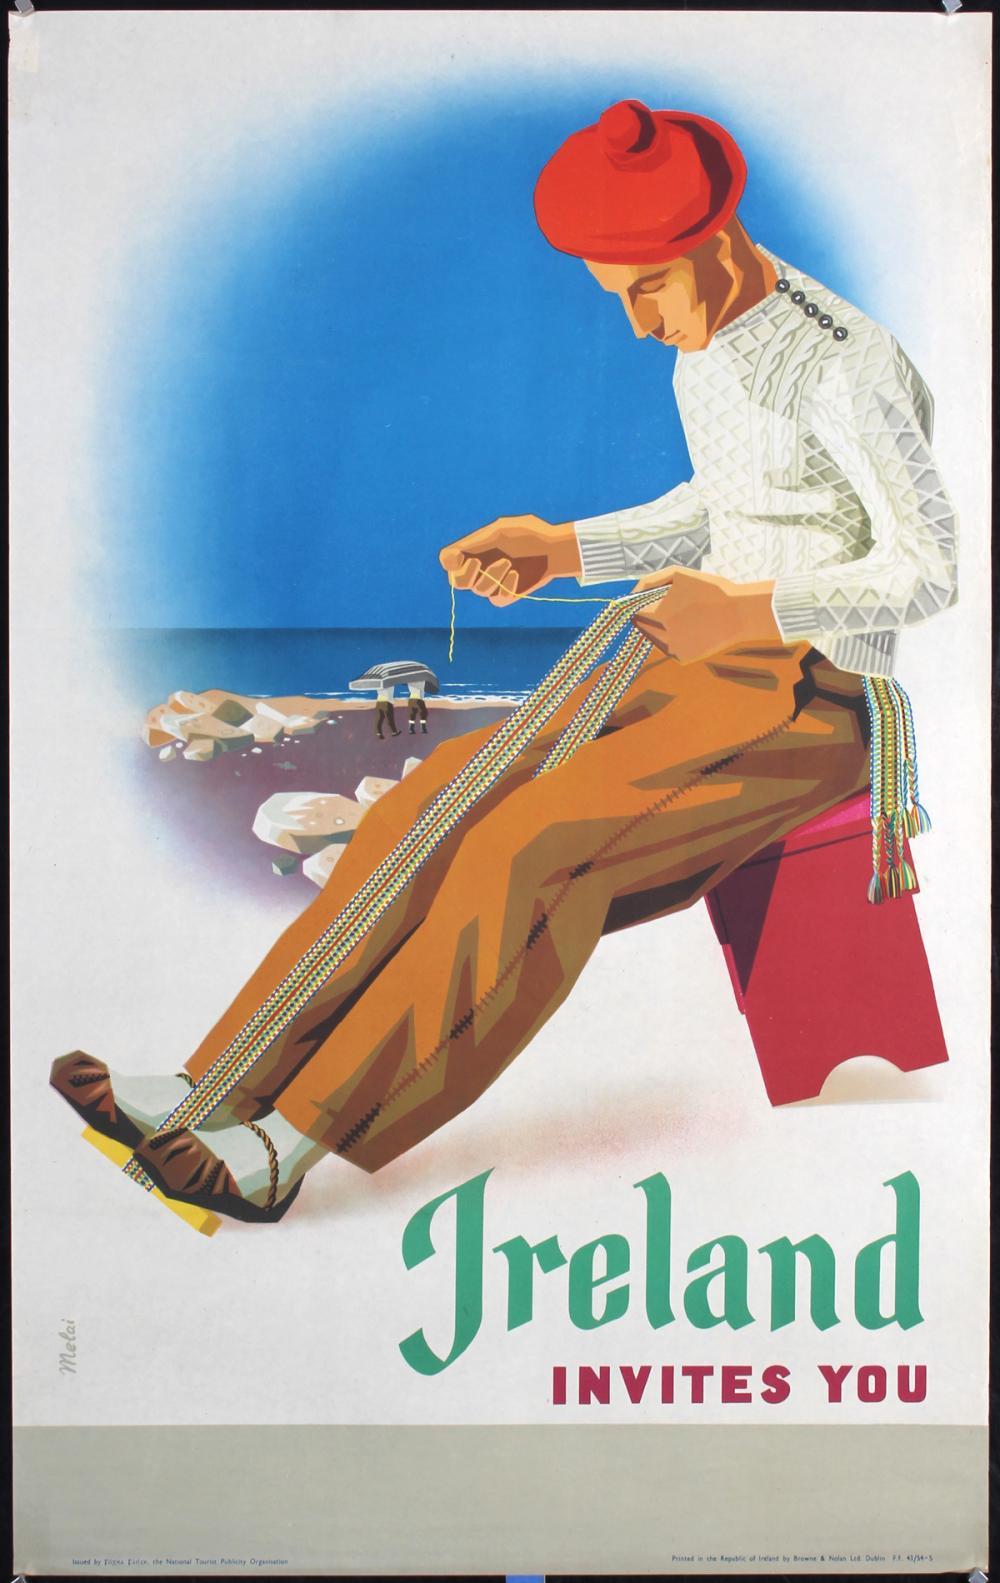 Original Vintage 1950s Ireland Travel Poster Melai Art